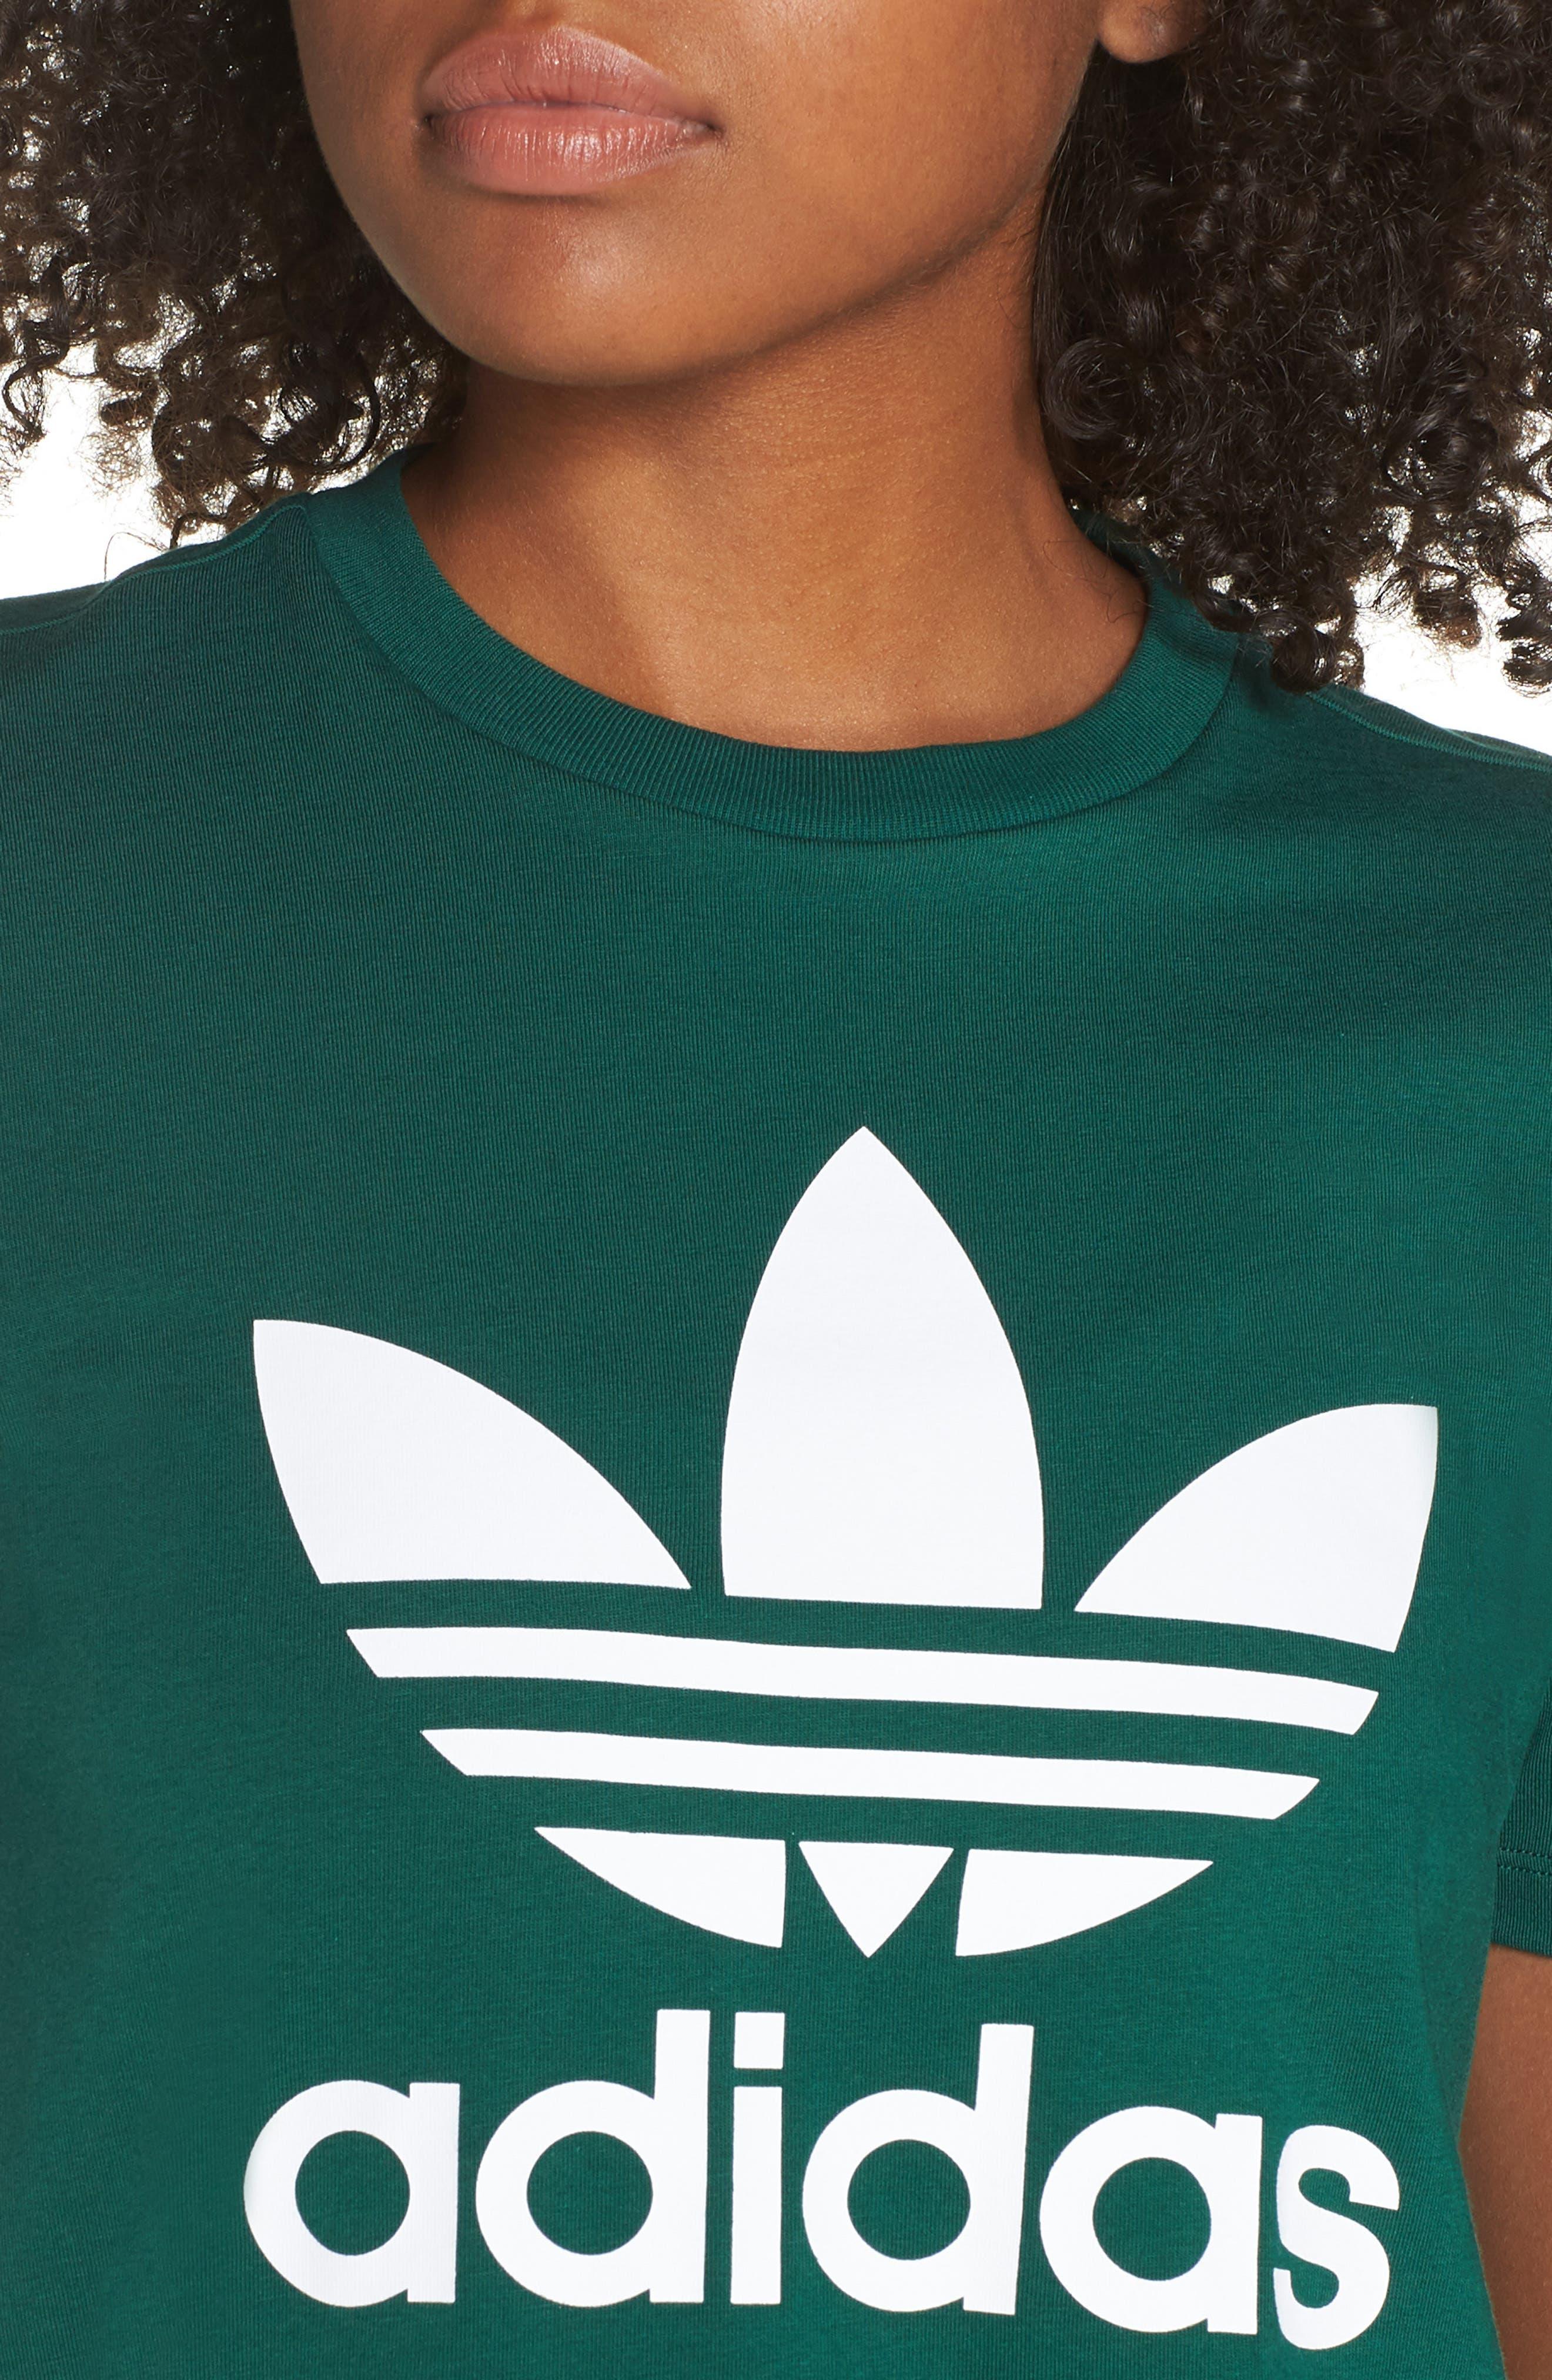 adidas Trefoil Tee,                             Alternate thumbnail 4, color,                             COLLEGIATE GREEN